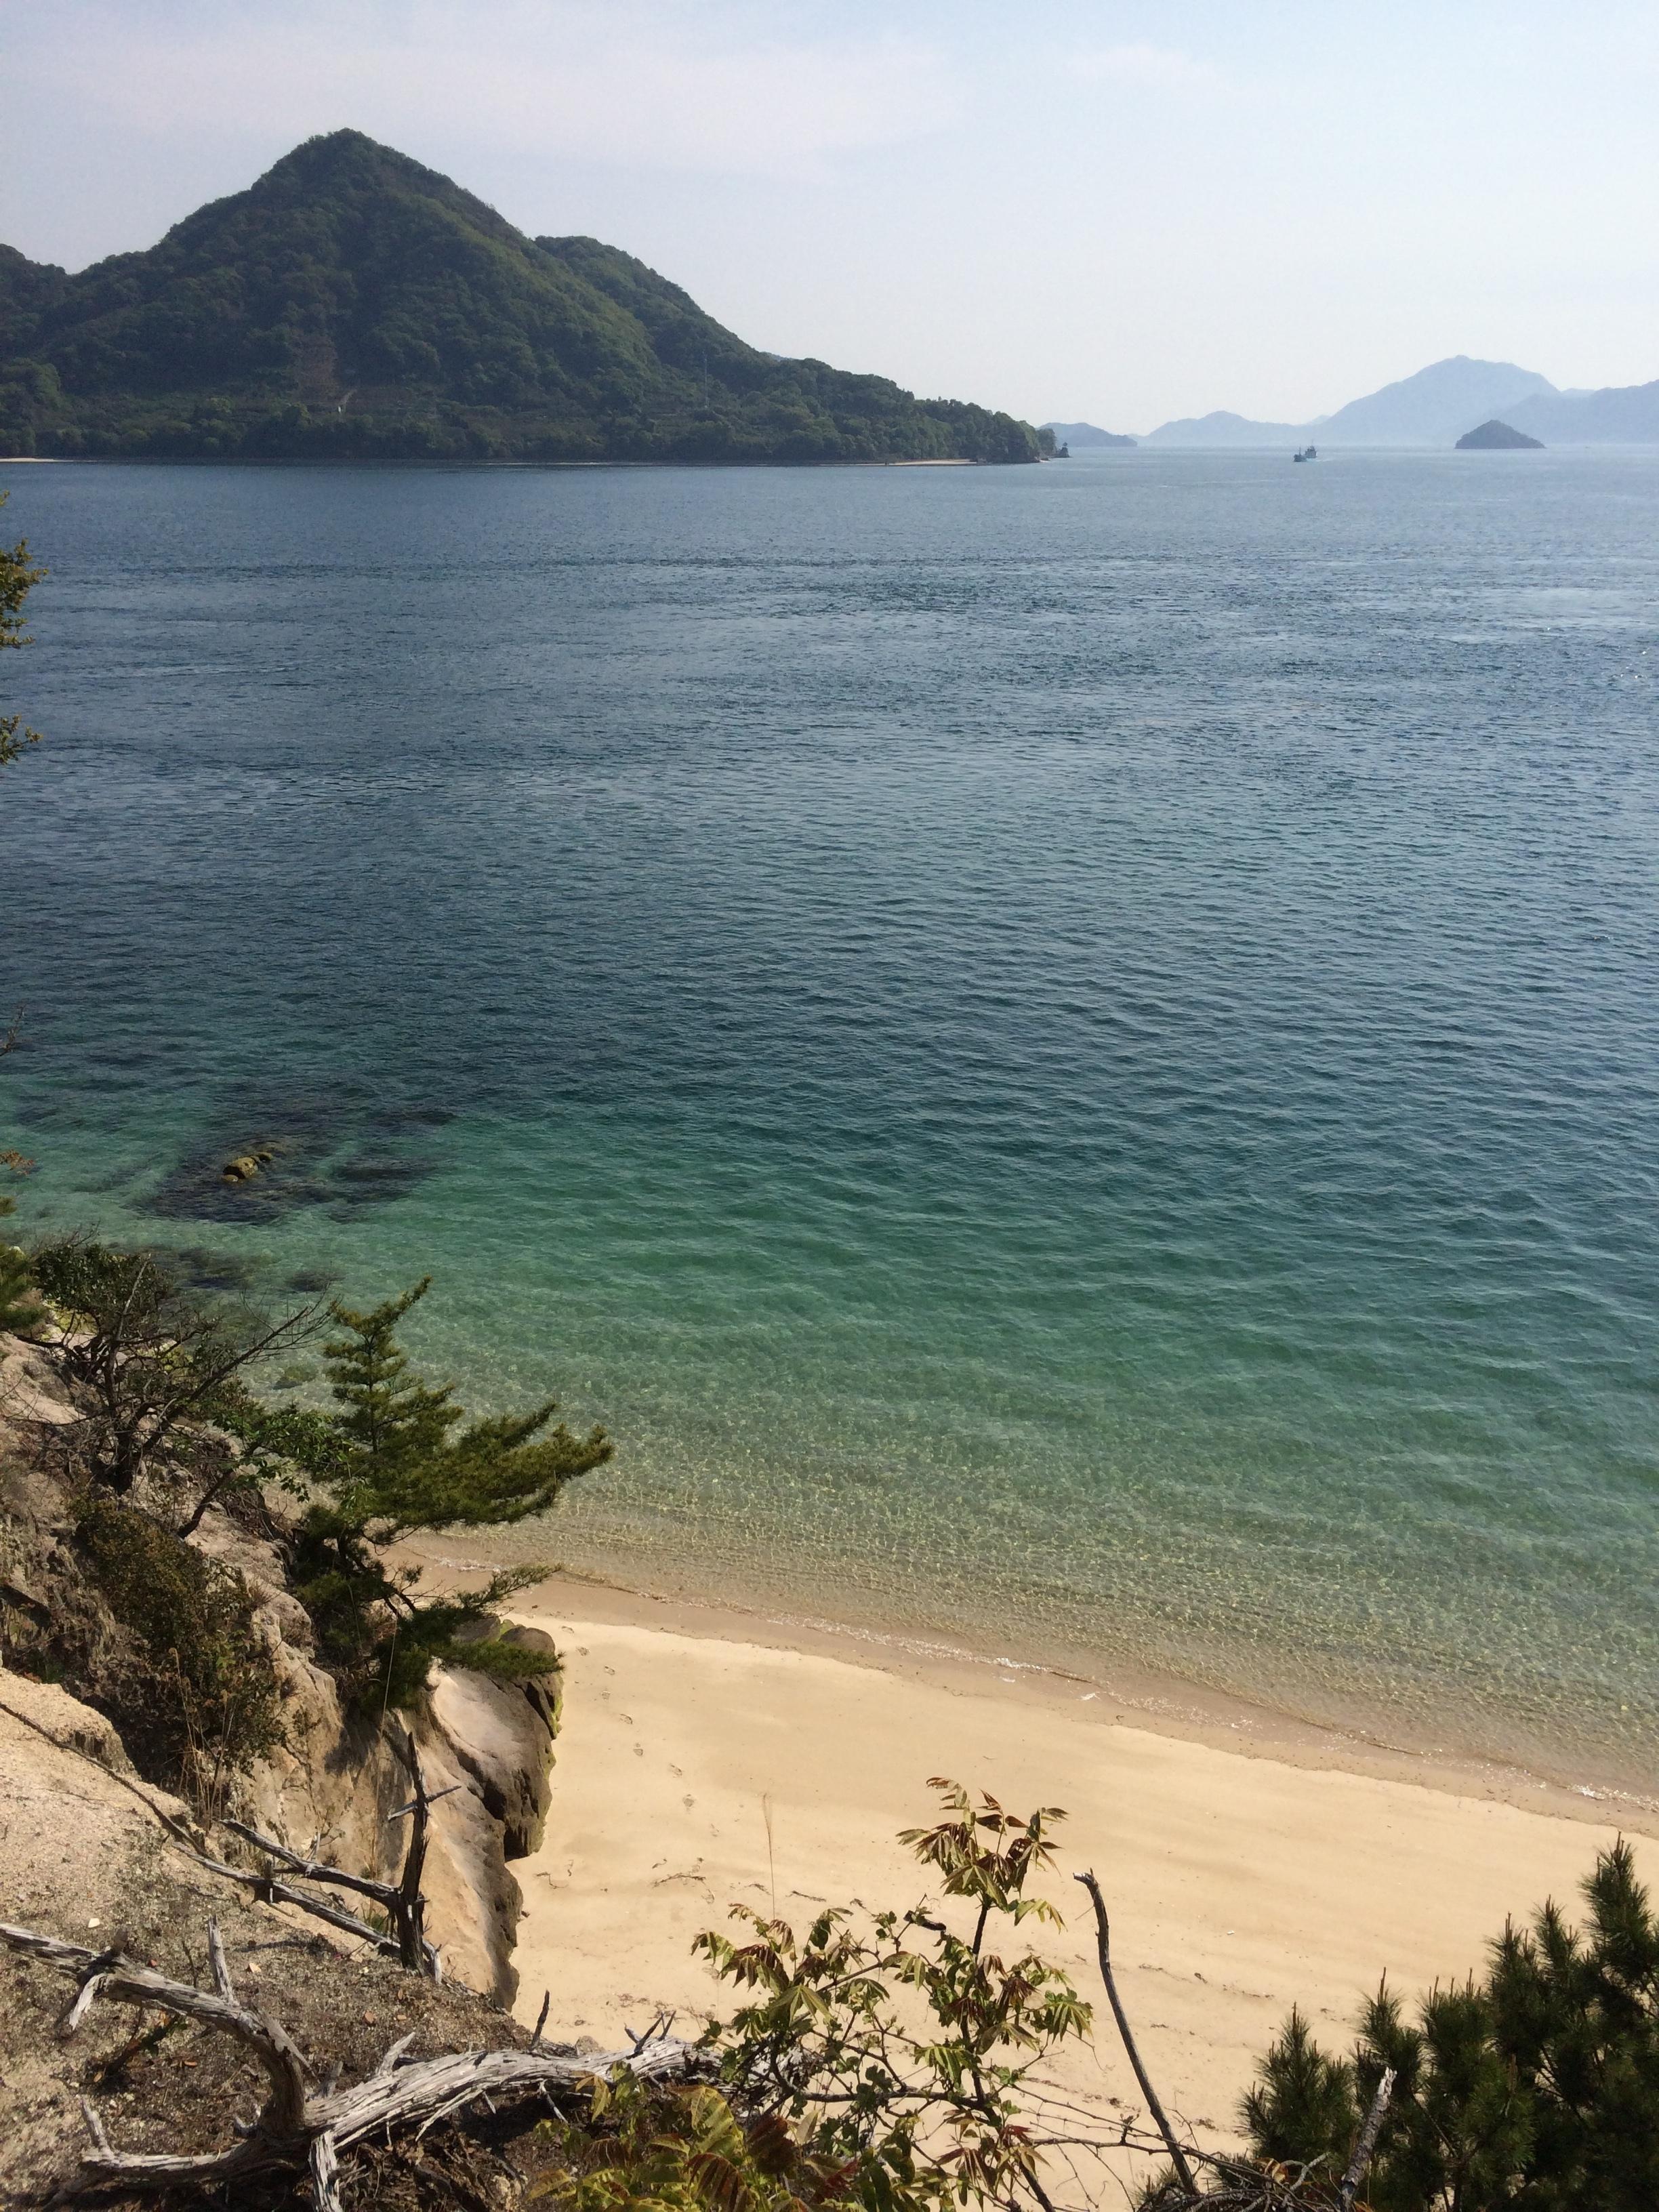 Inland Sea of Japan, Ōkunoshima